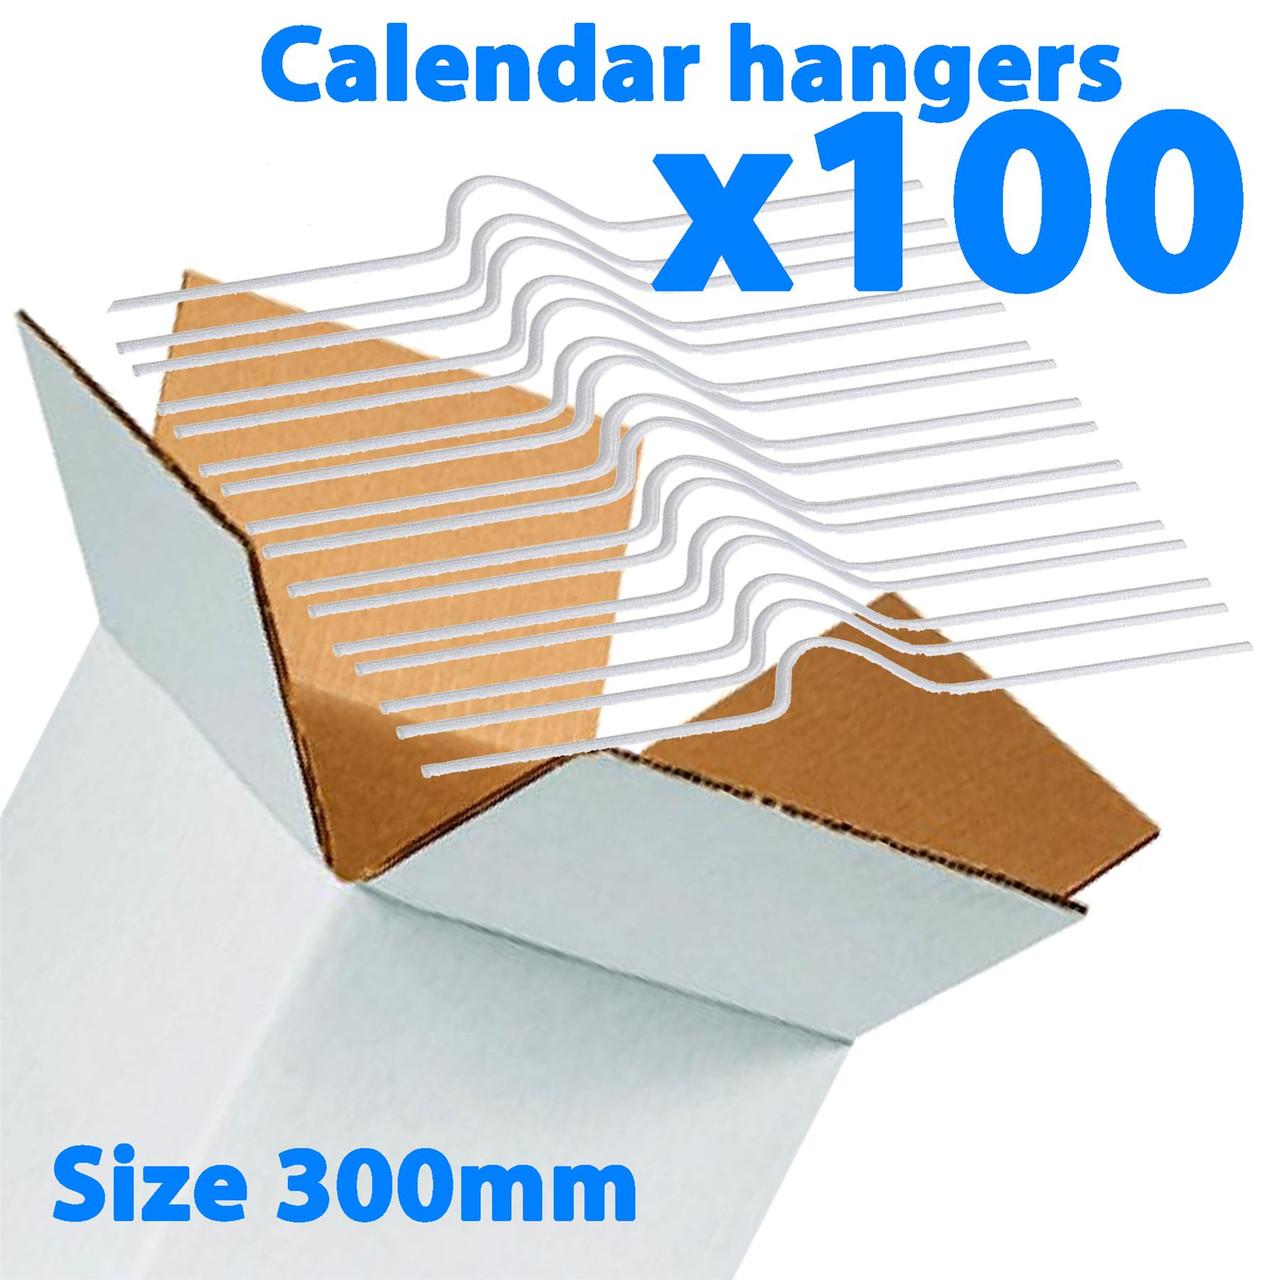 Galaxy 300mm Calendar Wire Hangers x 100